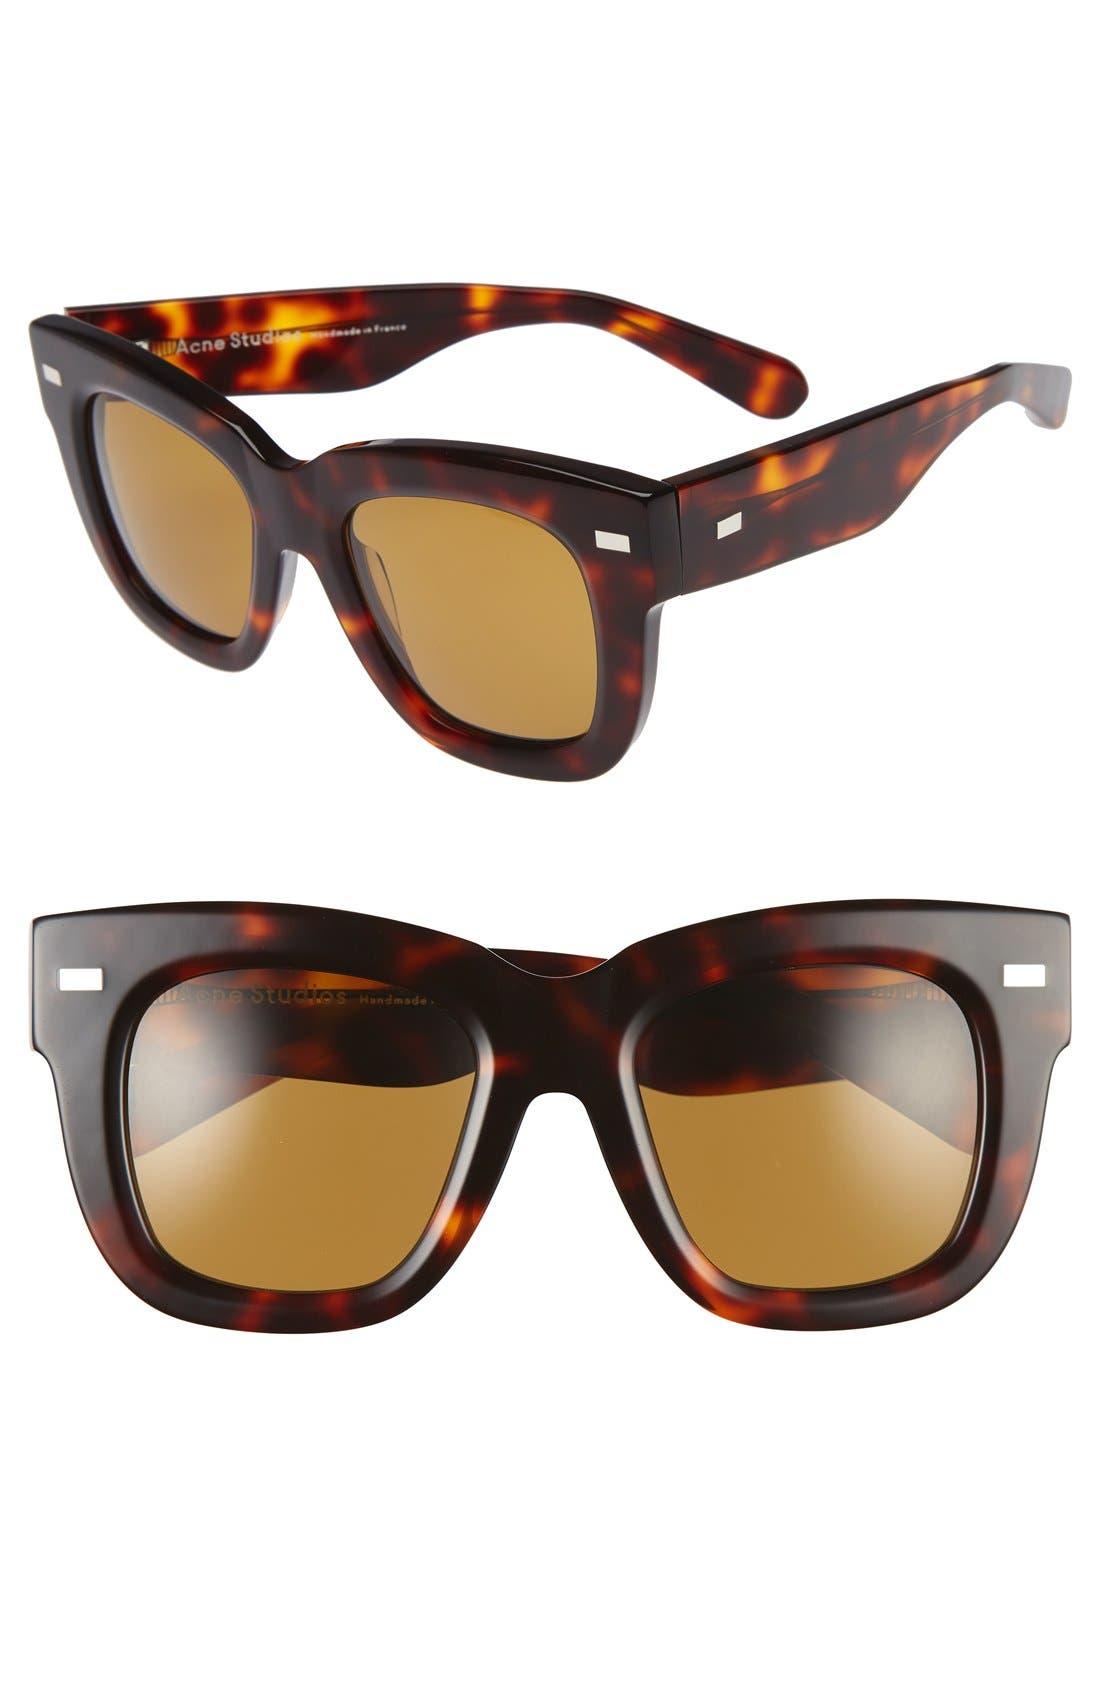 Main Image - ACNE Studios 'Library' 51mm Sunglasses